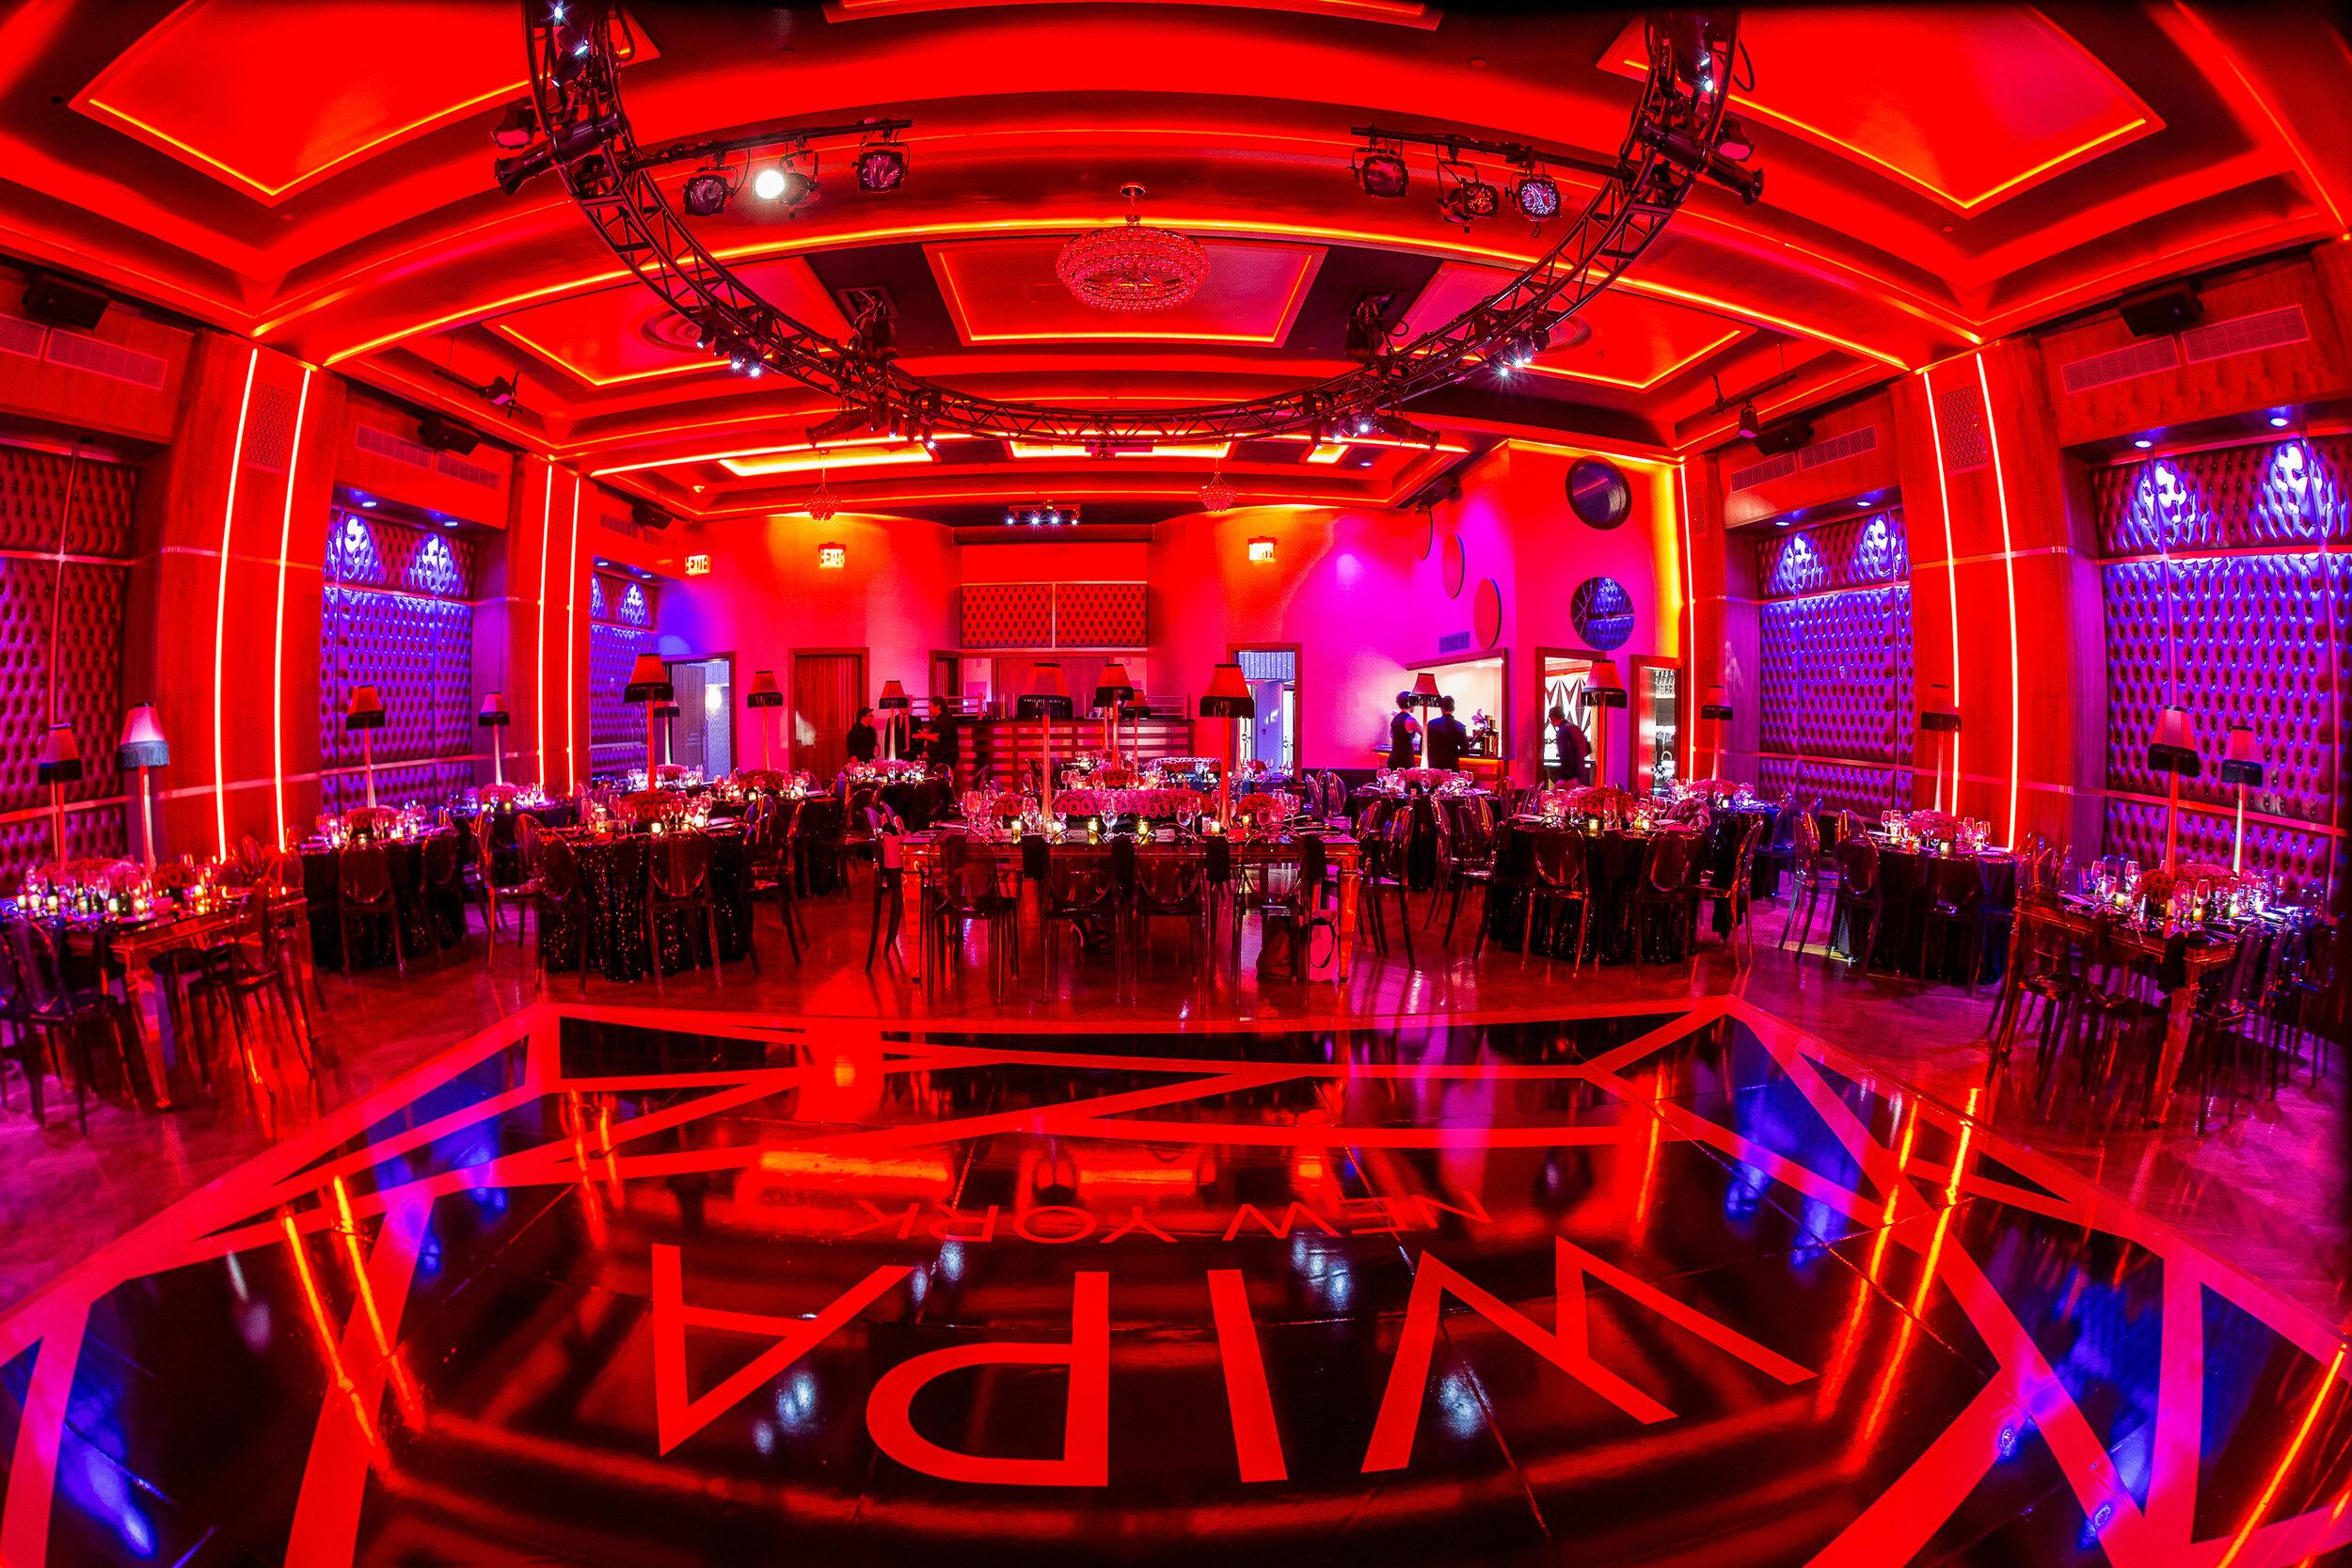 NYC-Non-Profit-Honoree-Gala-Andrea-Freeman-Events-13.jpg